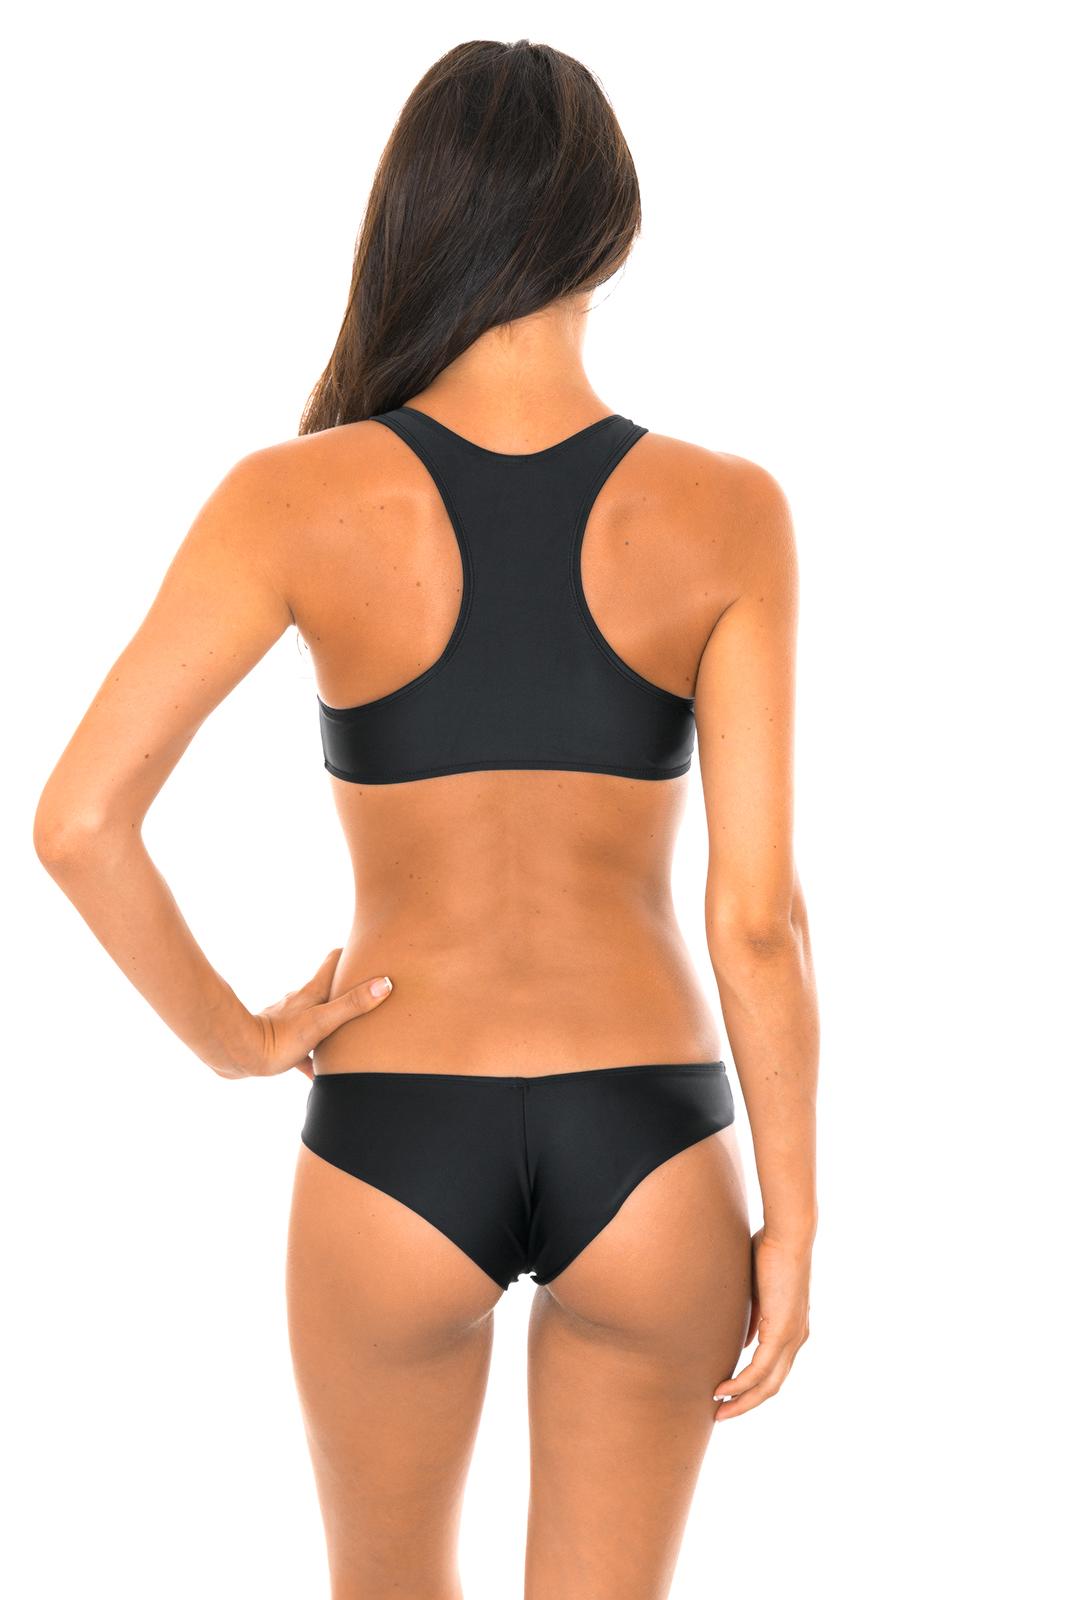 a0b655dcc1 Two Piece Swimwear Crop Top Sport Black Bikini - Sporty Preto